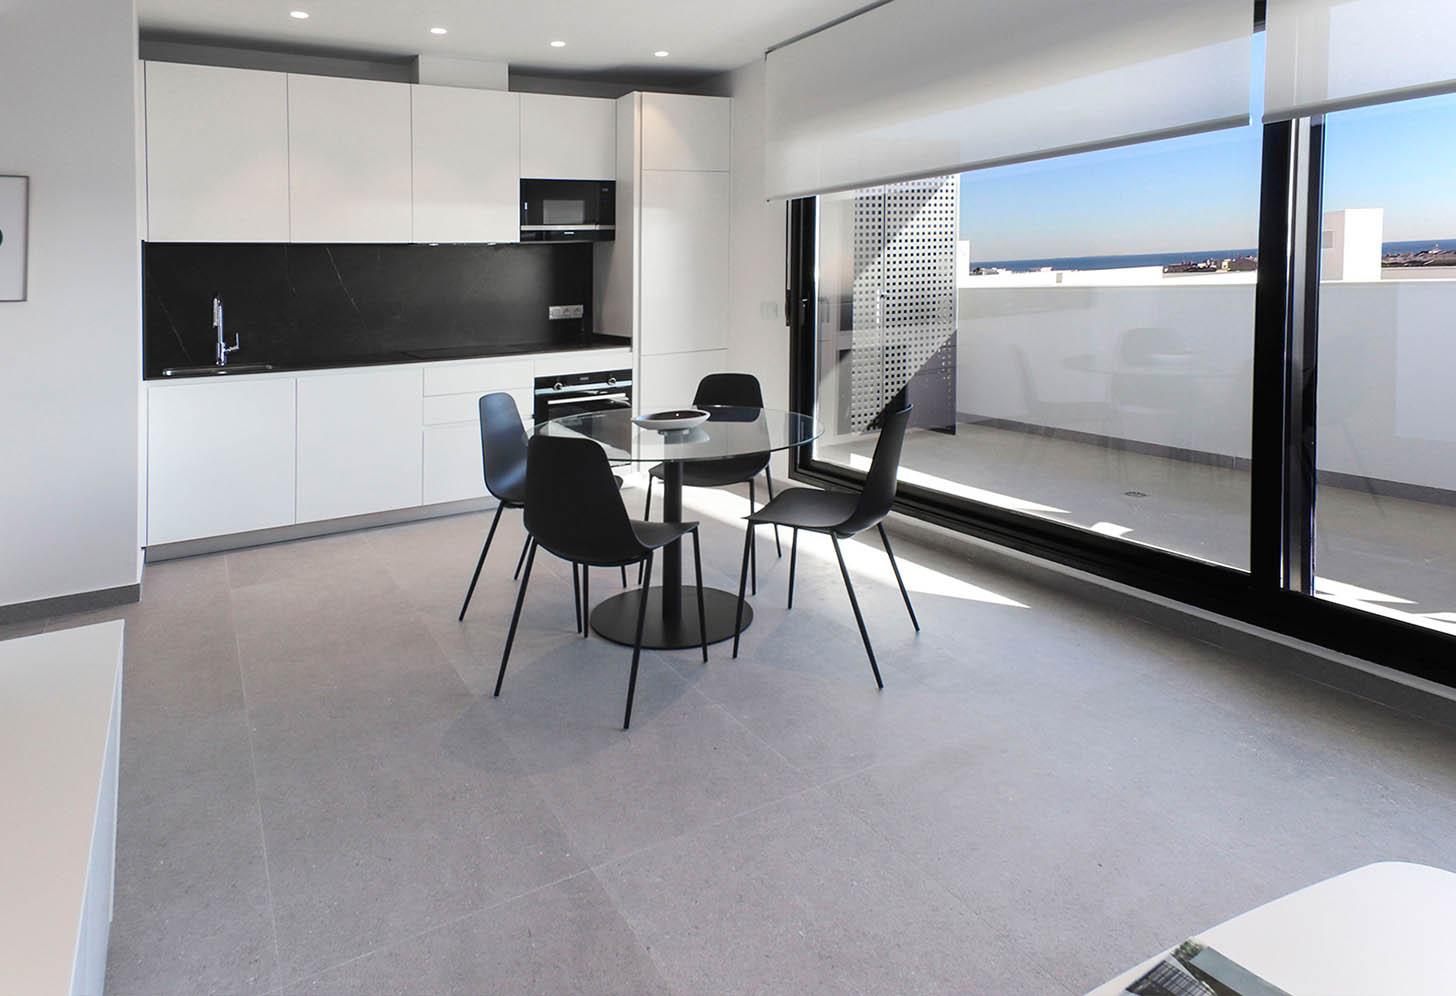 immobilier neuf espagne costa blanca on-3 essence apparts salon 2